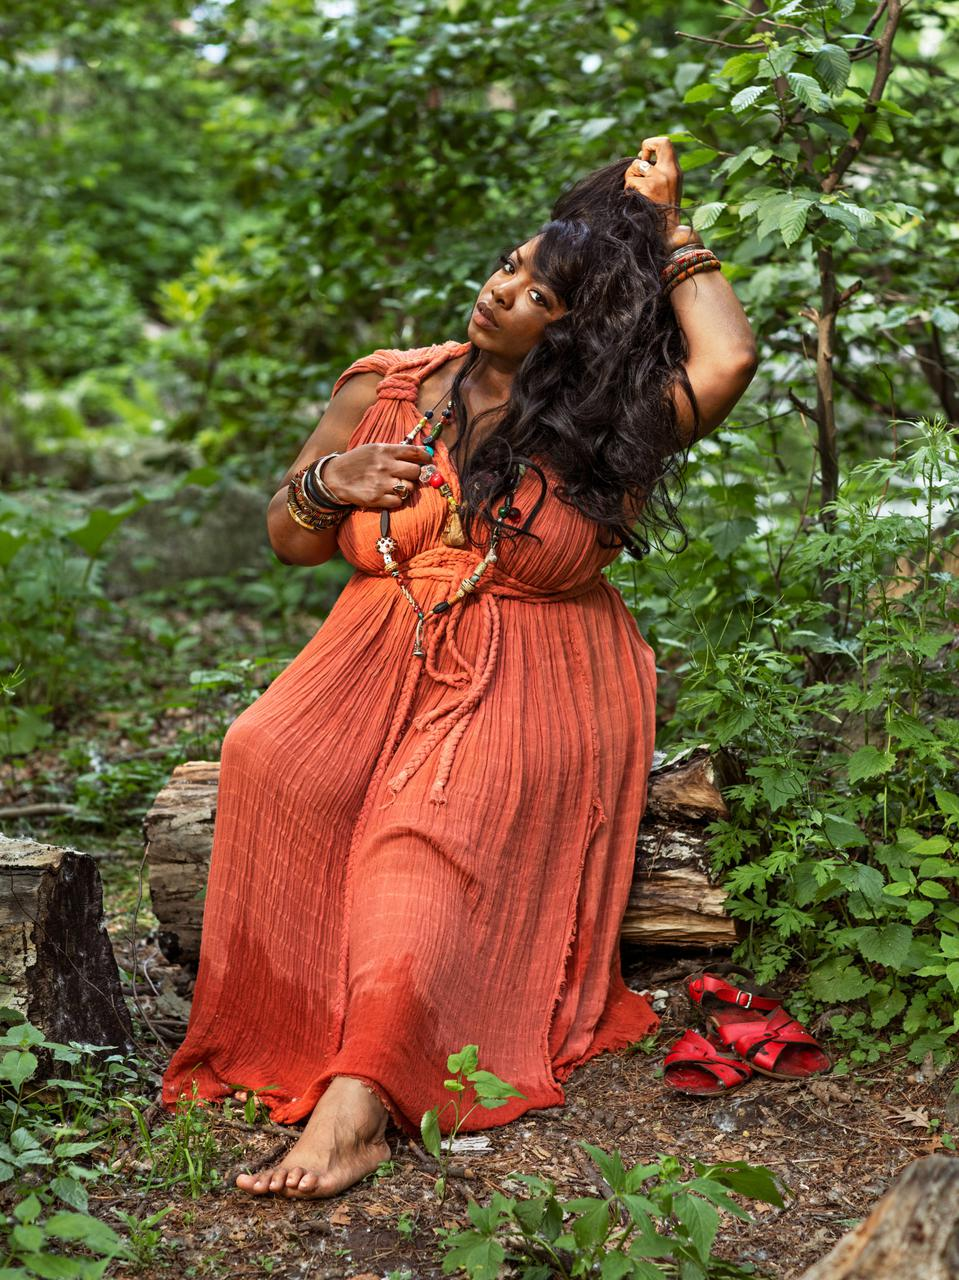 A witch in an orange dress